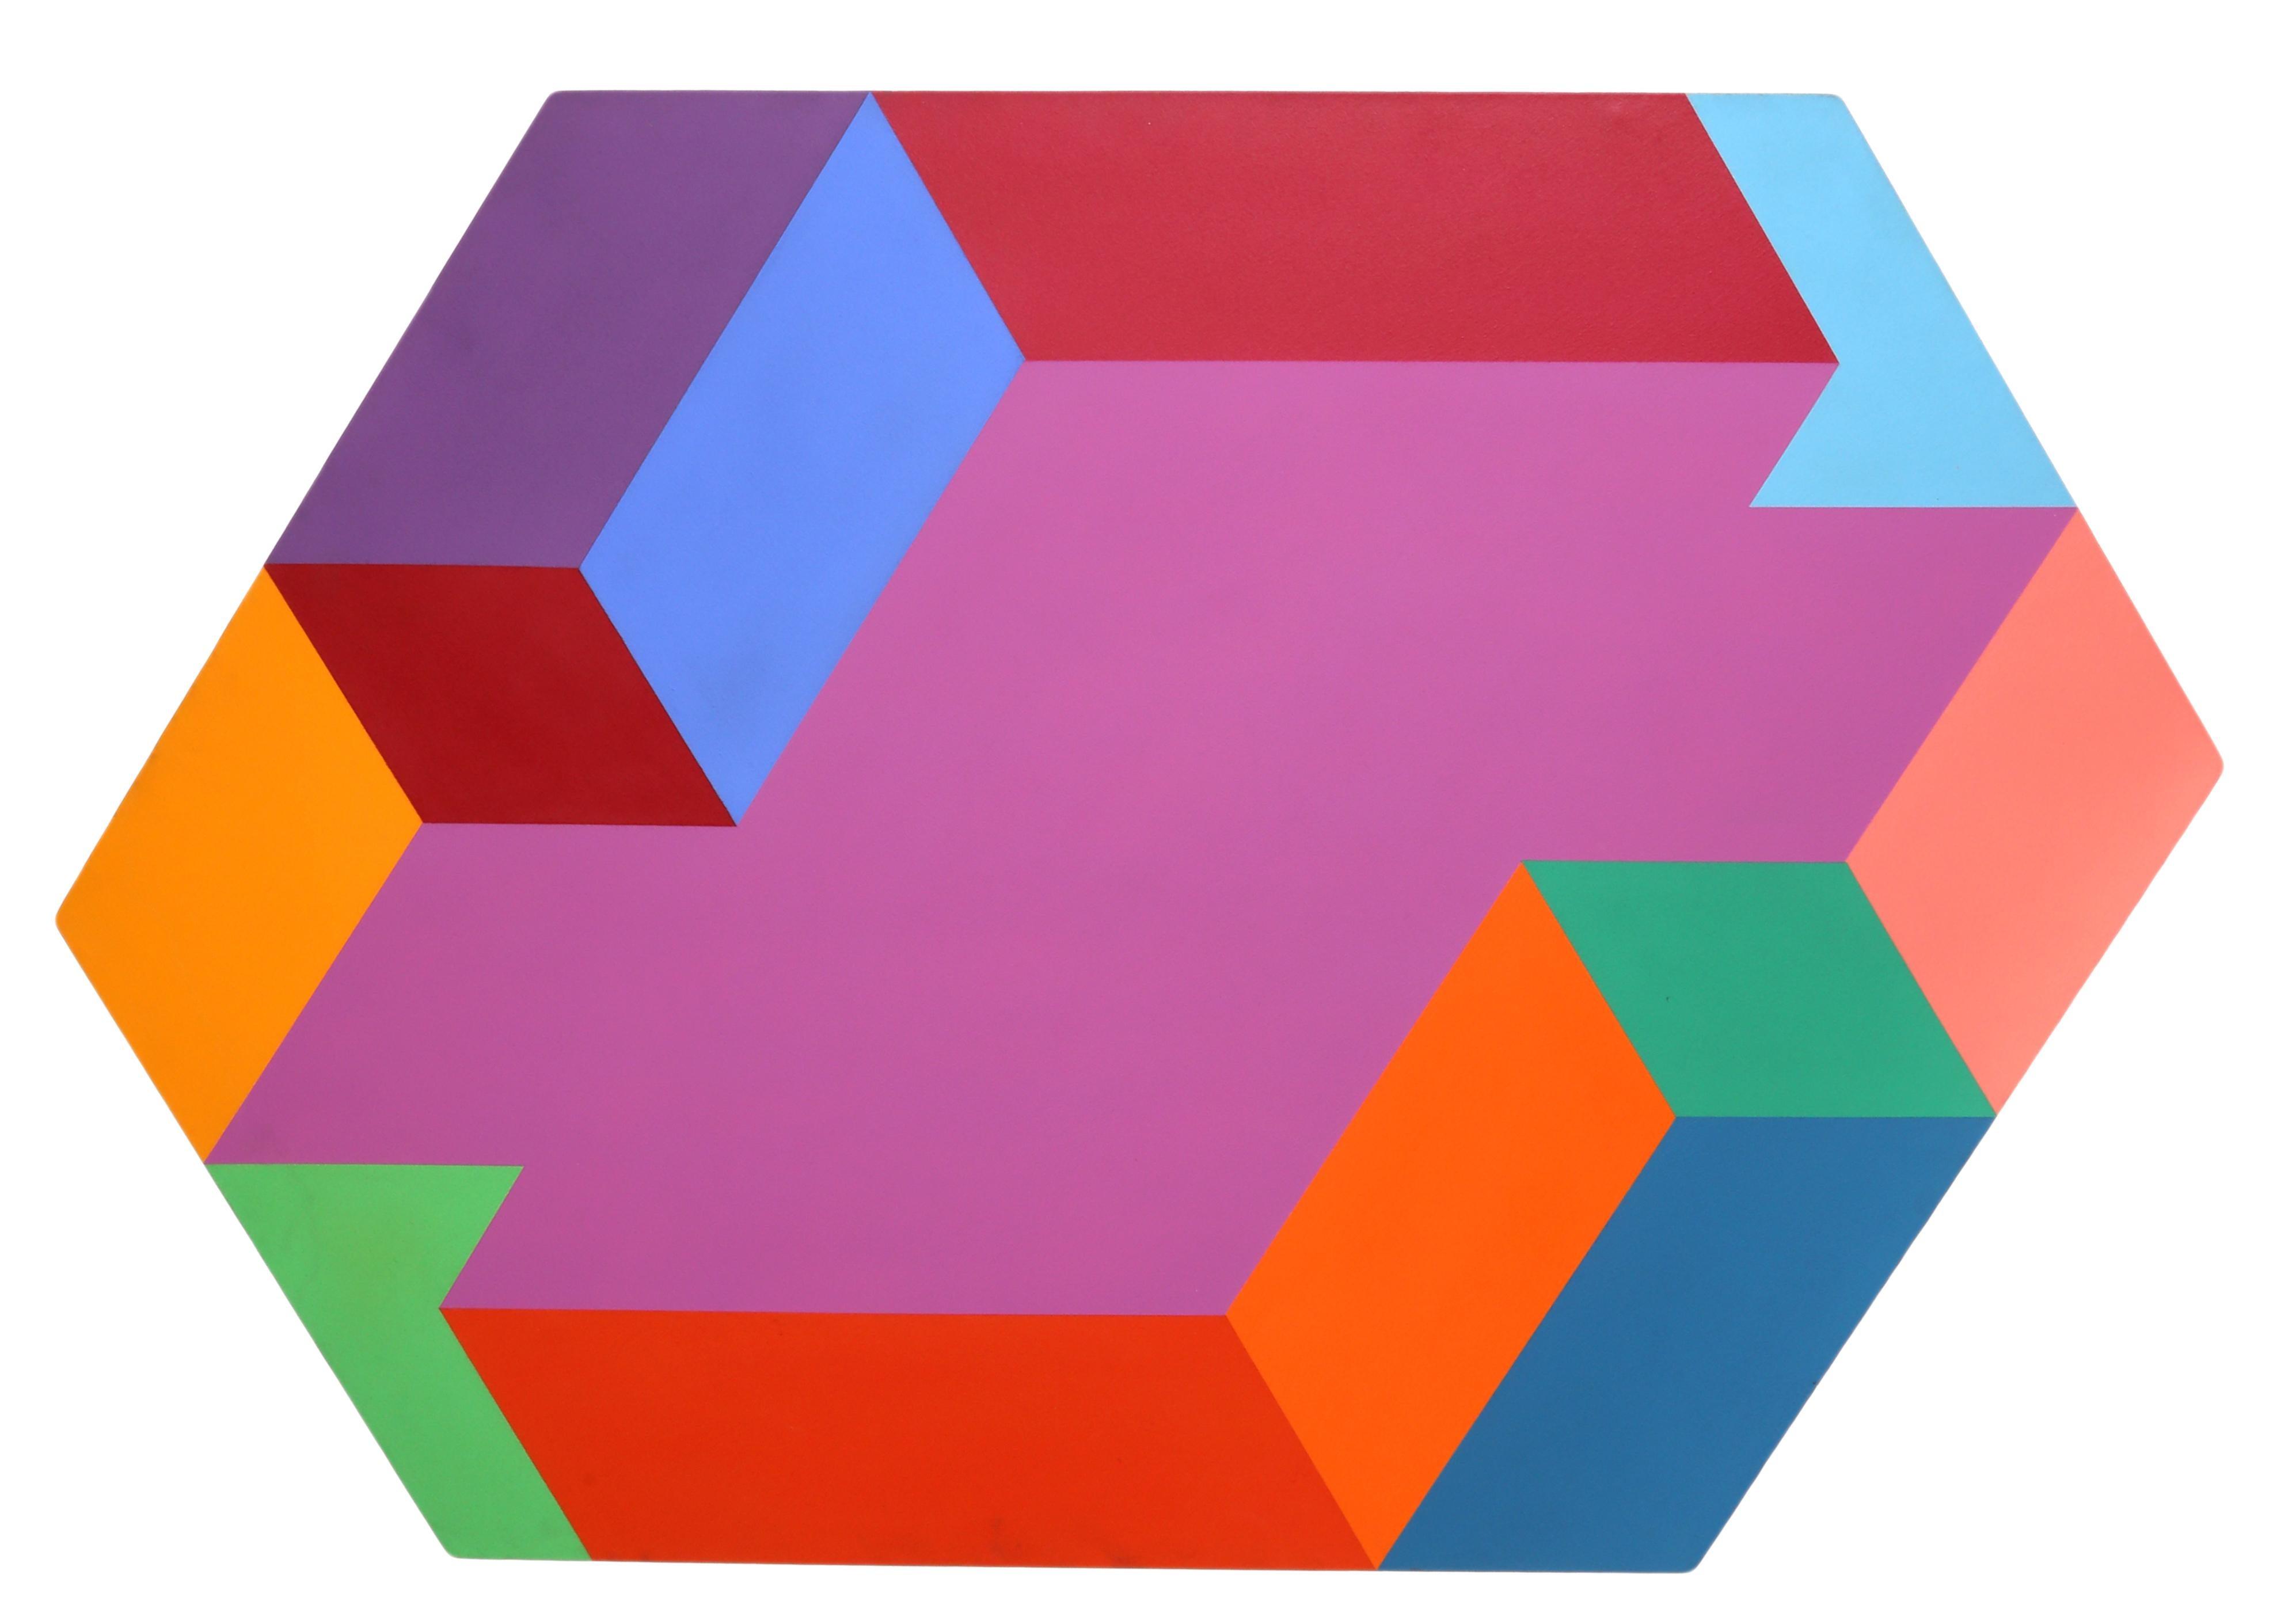 Hexagon, Large OP Art Painting by Arthur Boden